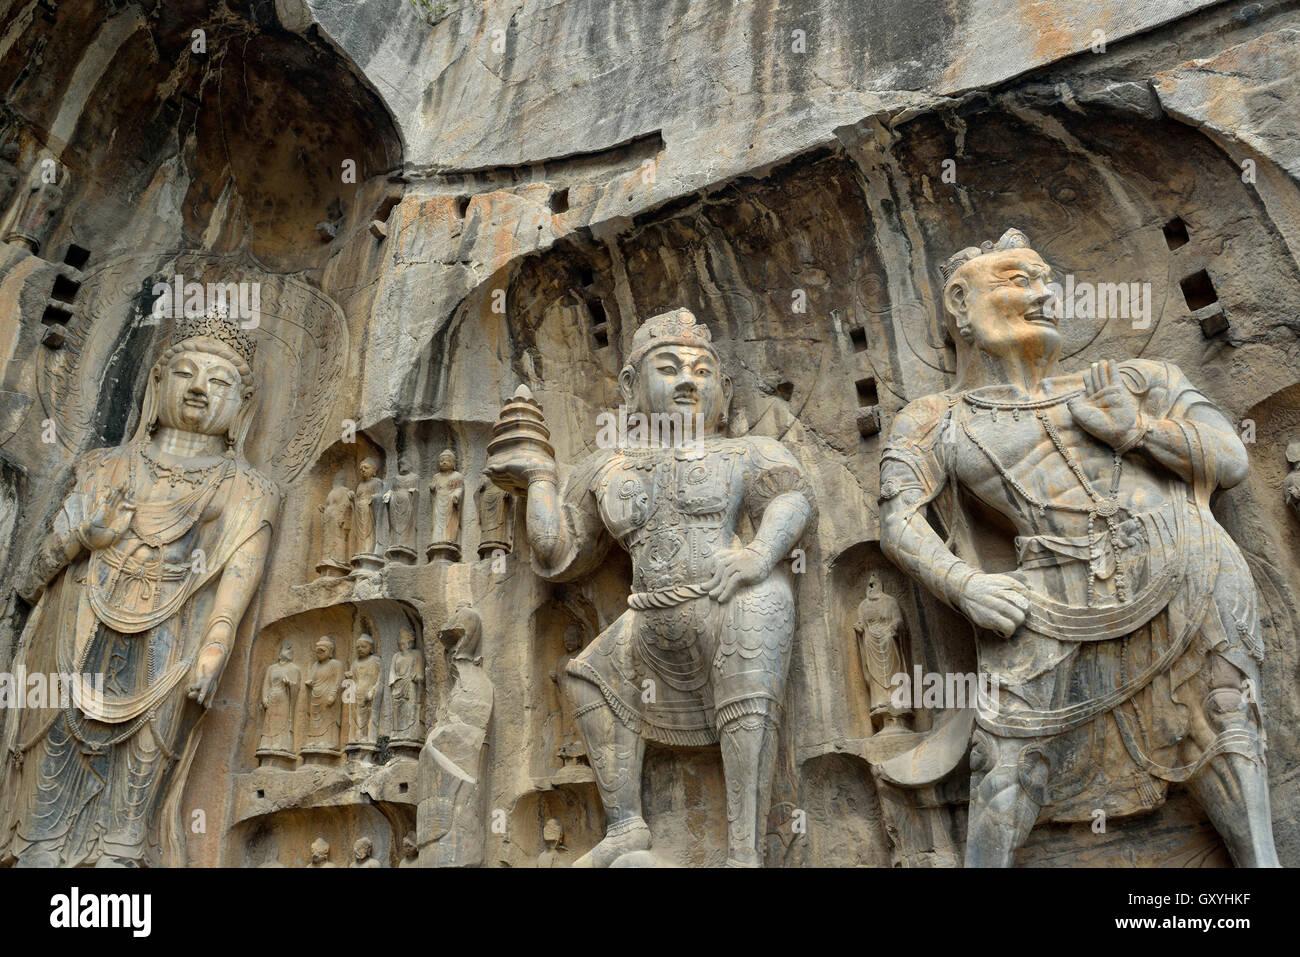 Longmen Grottoes in Luoyang, Henan province, China. 09-Sep-2016 - Stock Image